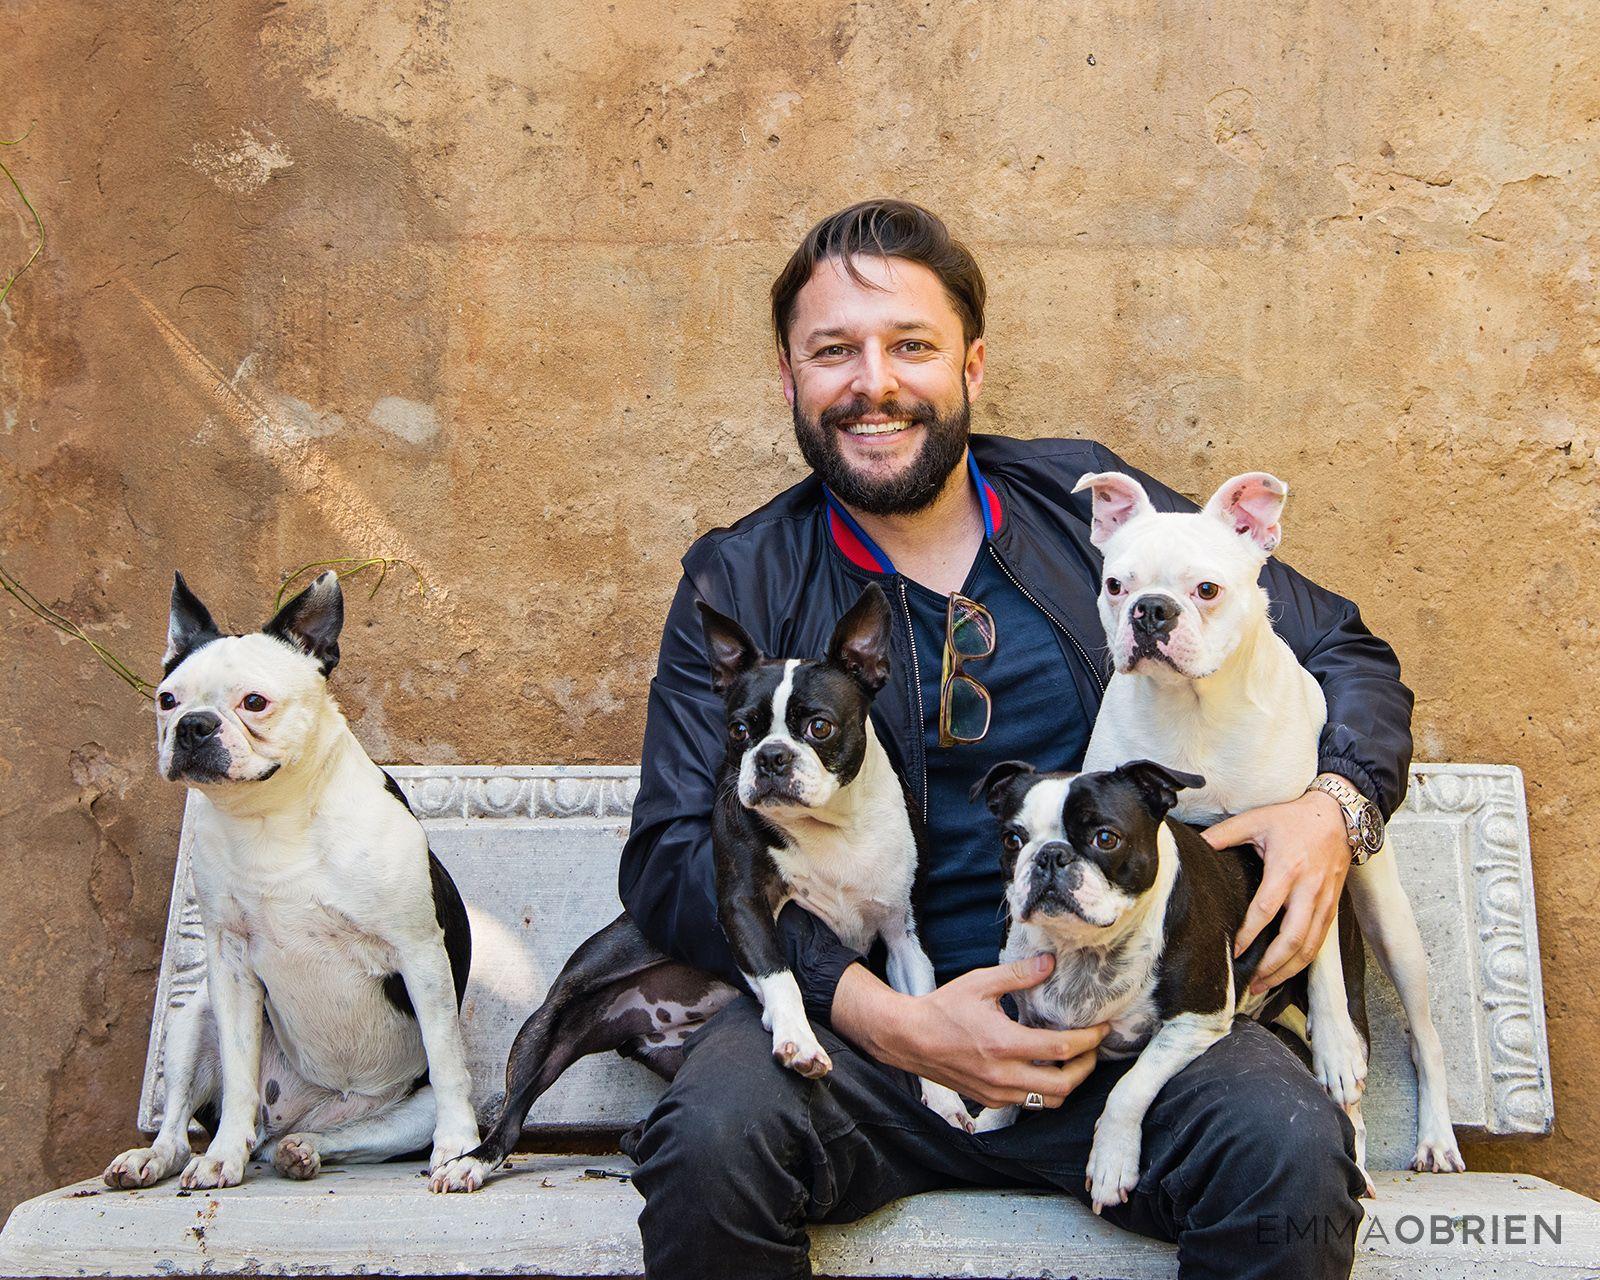 Roger Goode Photographed For Pet Prints Magazine Bostonterrier